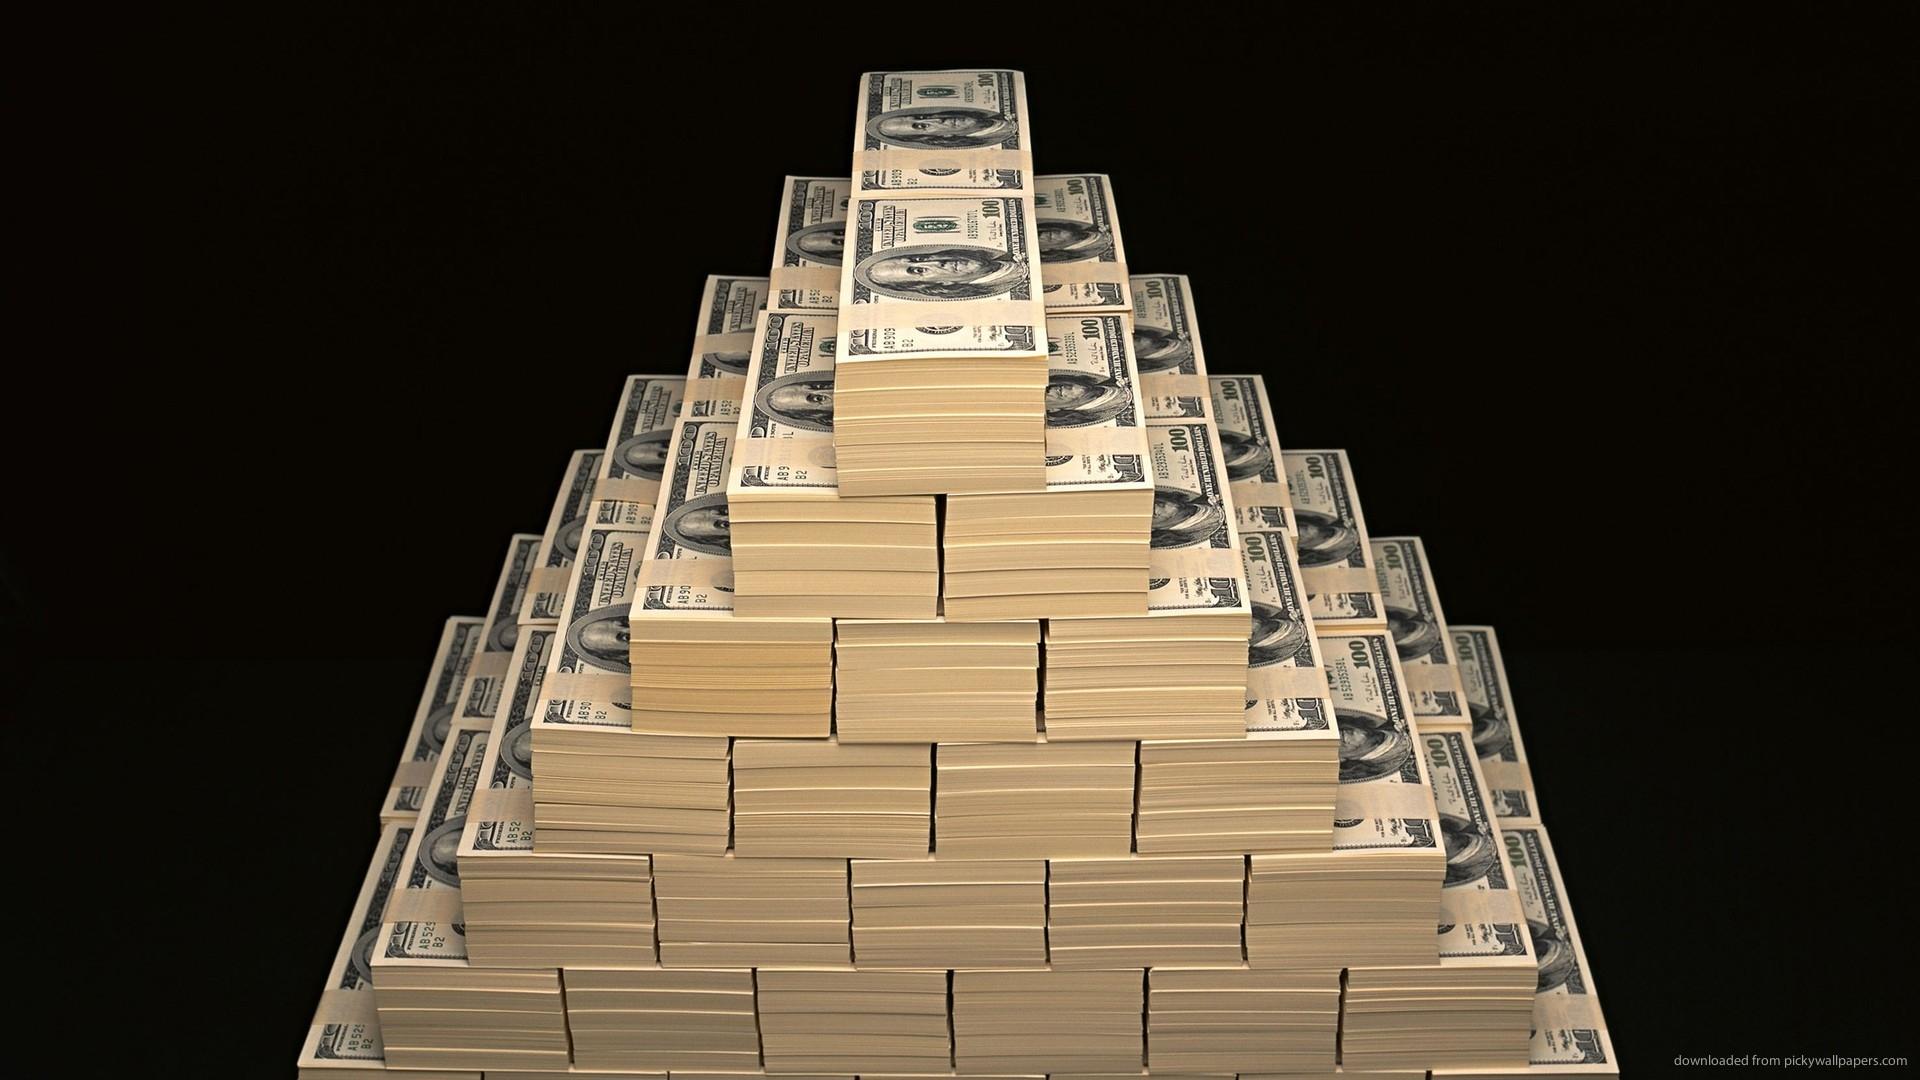 1920x1080 HD Money Pyramids Wallpaper